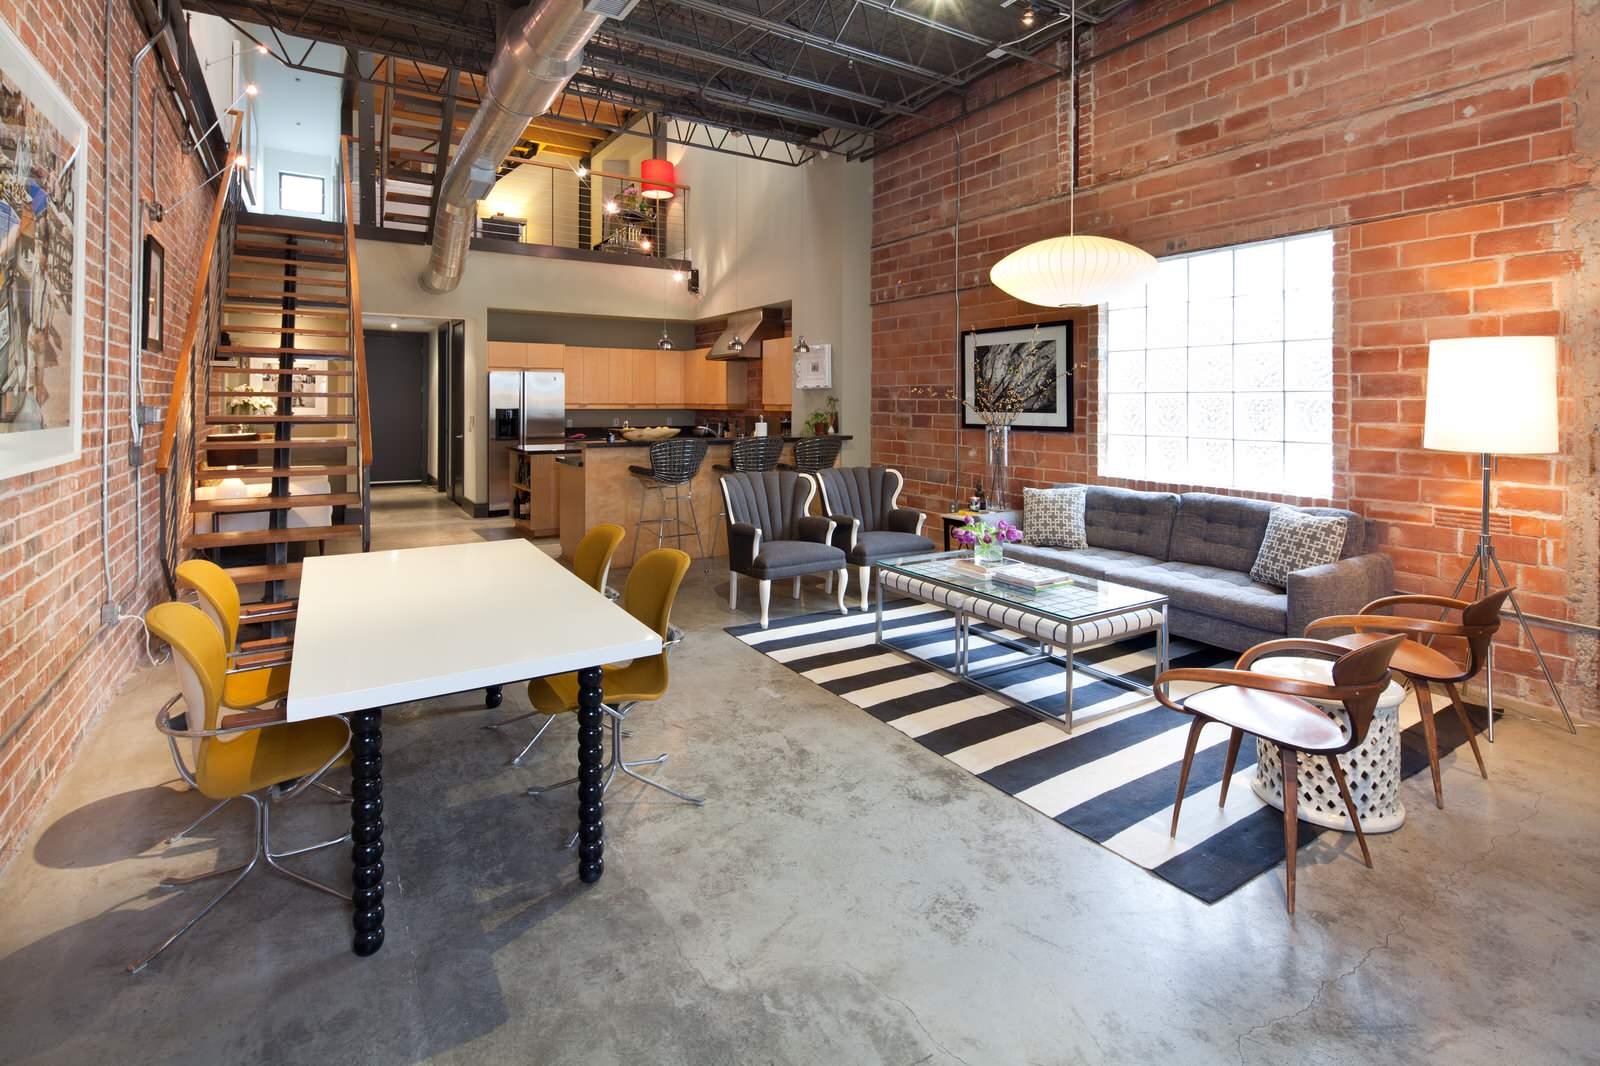 Industrial Living Room Decor Industrial Living Room Ideas Interior Design Ideas And Photos